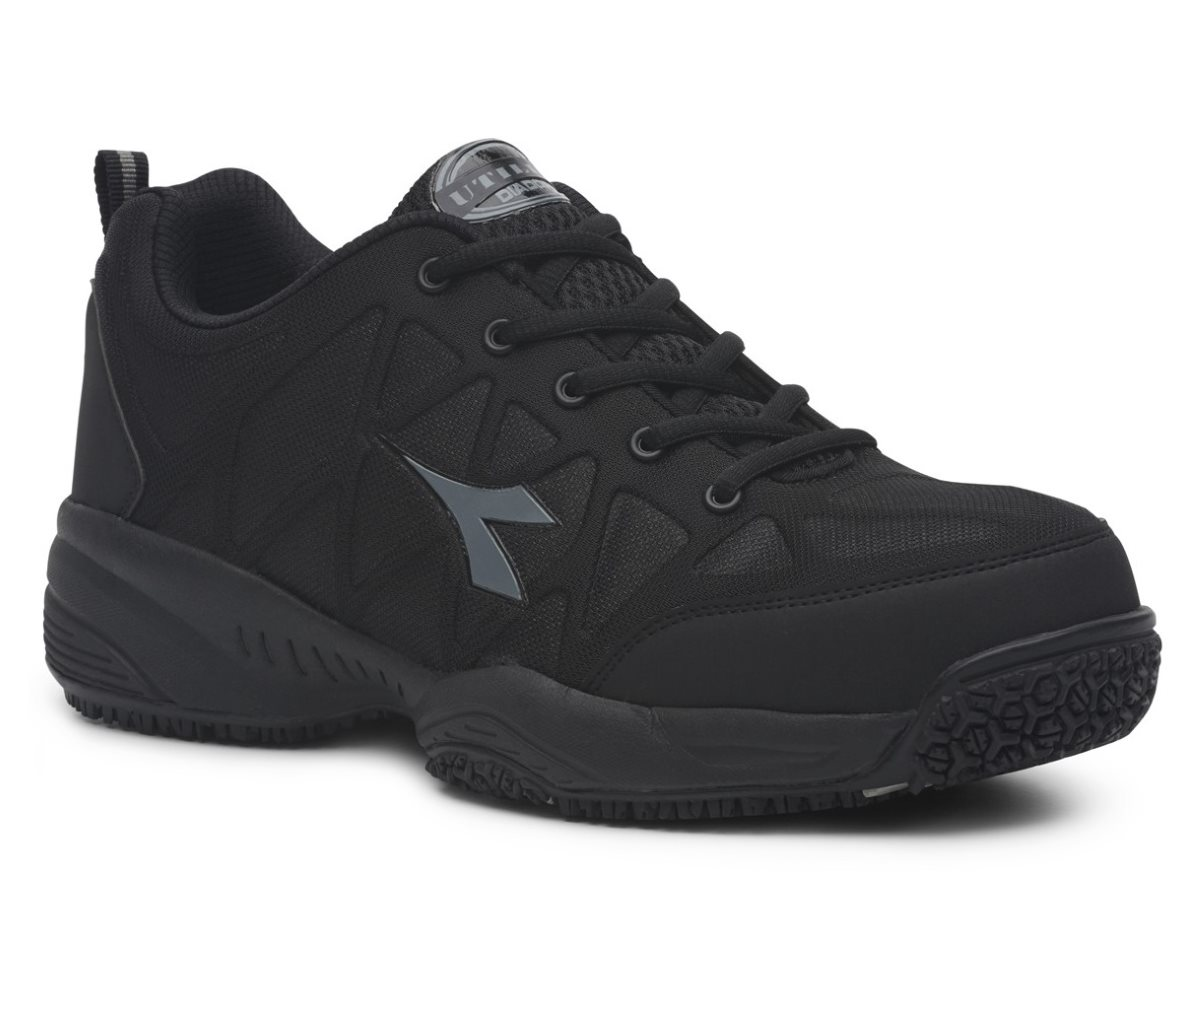 Diadora Comfort Worker Safety Sneaker